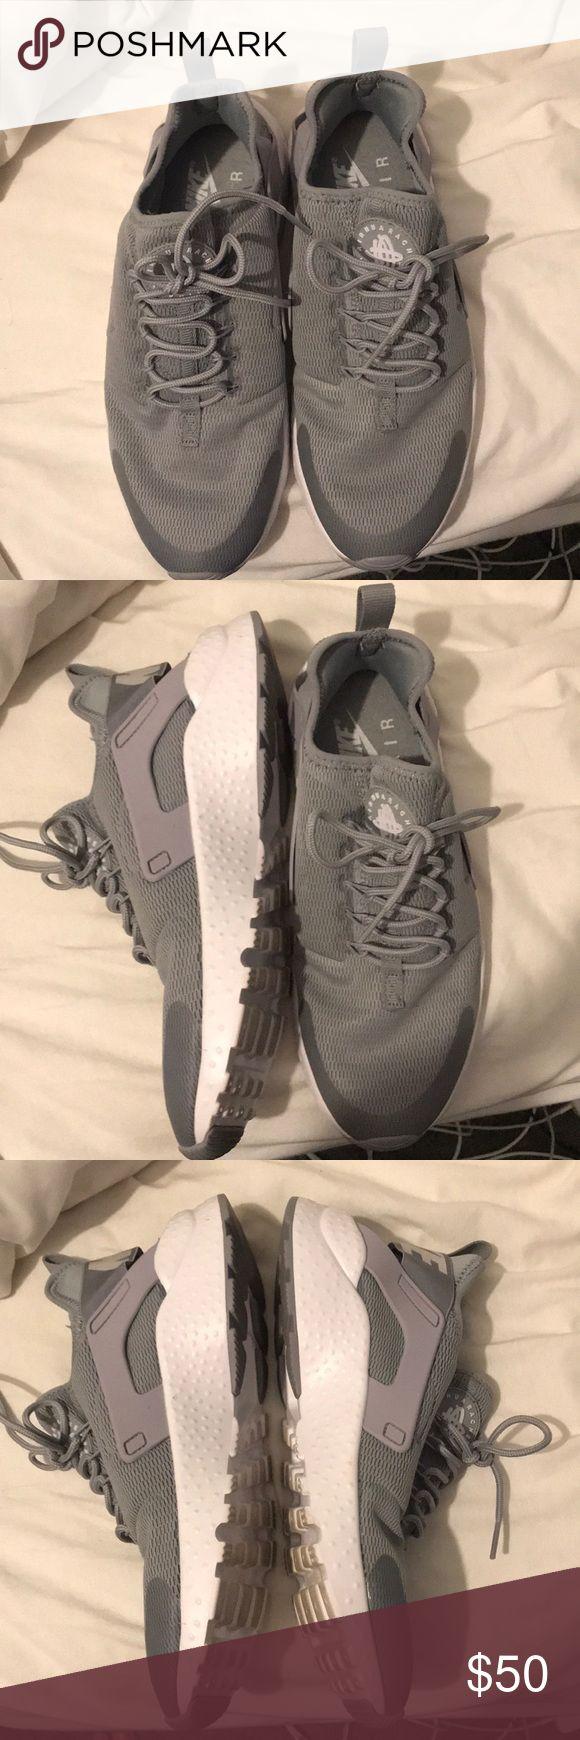 grey nike huaraches size 9.5 worn twice grey nike huaraches in great condition worn only twice Nike Shoes Sneakers